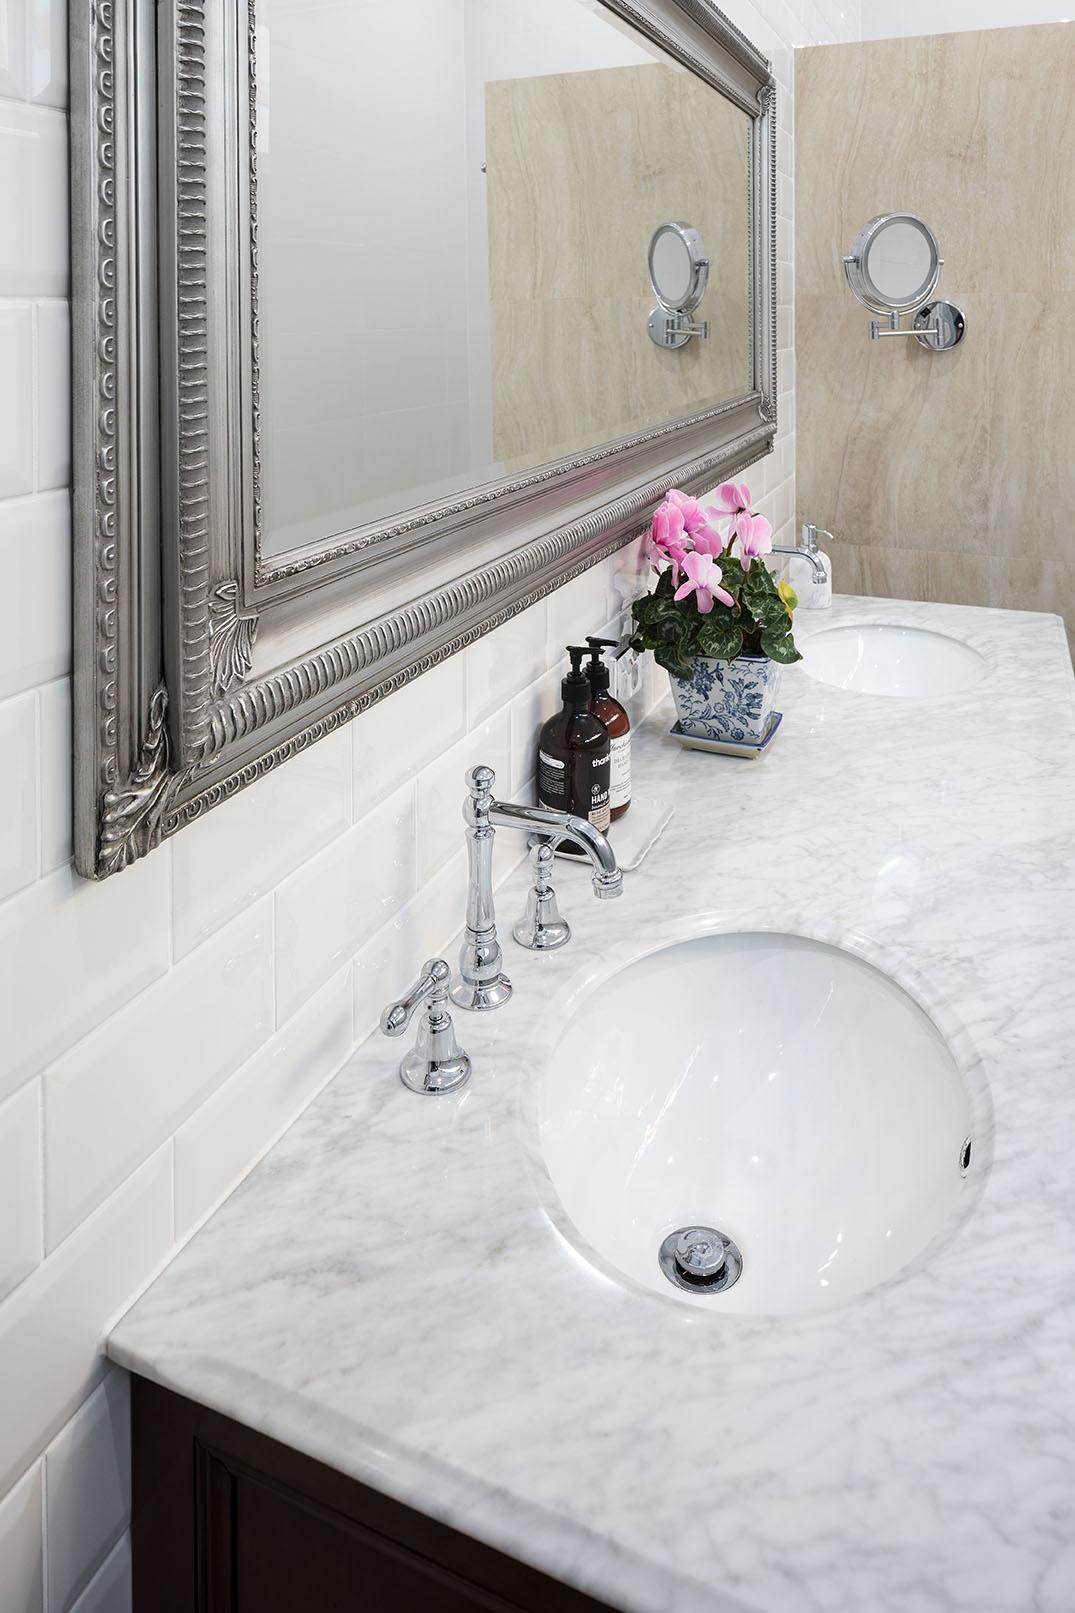 clive_bathroom_02.jpg